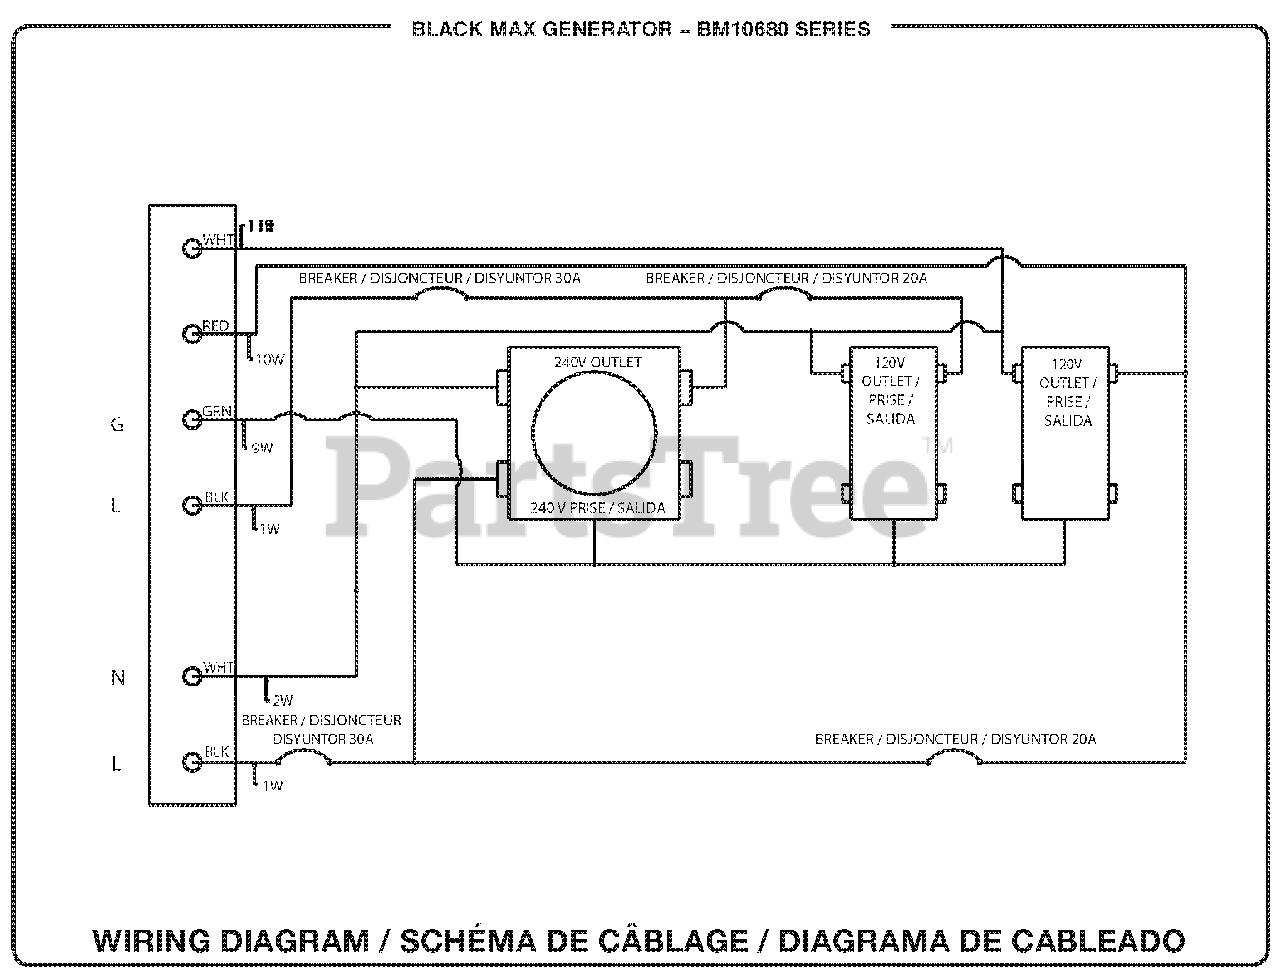 [SODI_2457]   Black Max BM 10680 - Black Max 6,800 Watt Generator Wiring Diagram Parts  Lookup with Diagrams   PartsTree   Black Max Generator Wiring Schematic      PartsTree